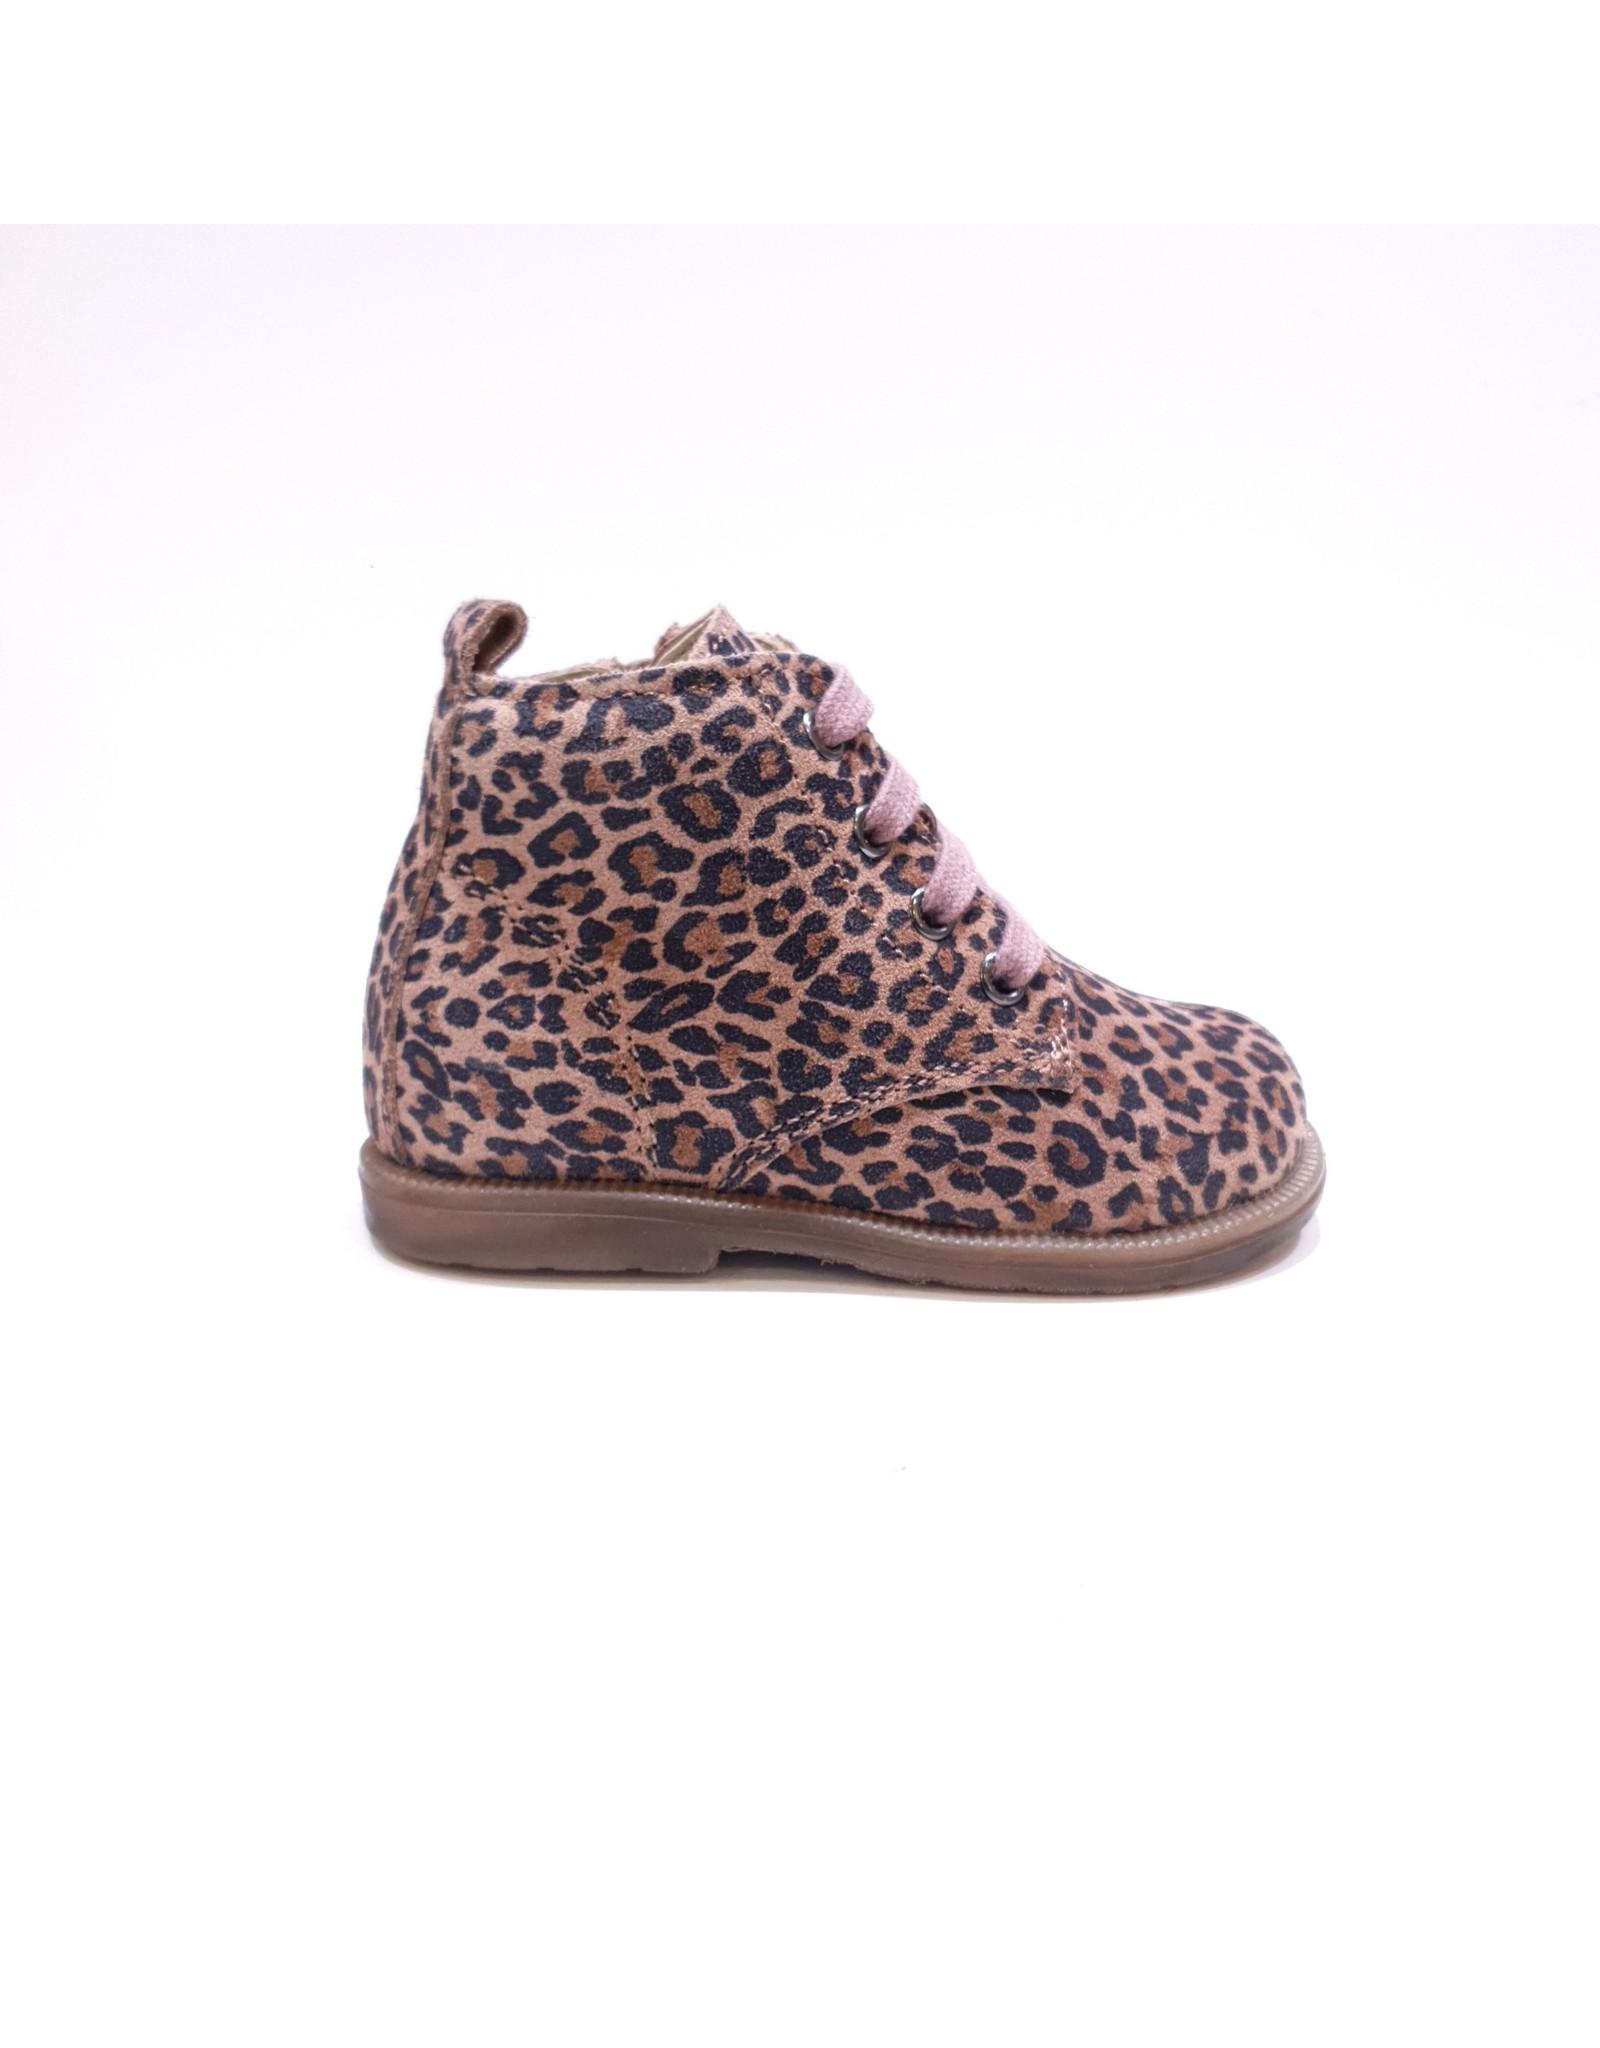 Falcotto veterlaars robin new leopard